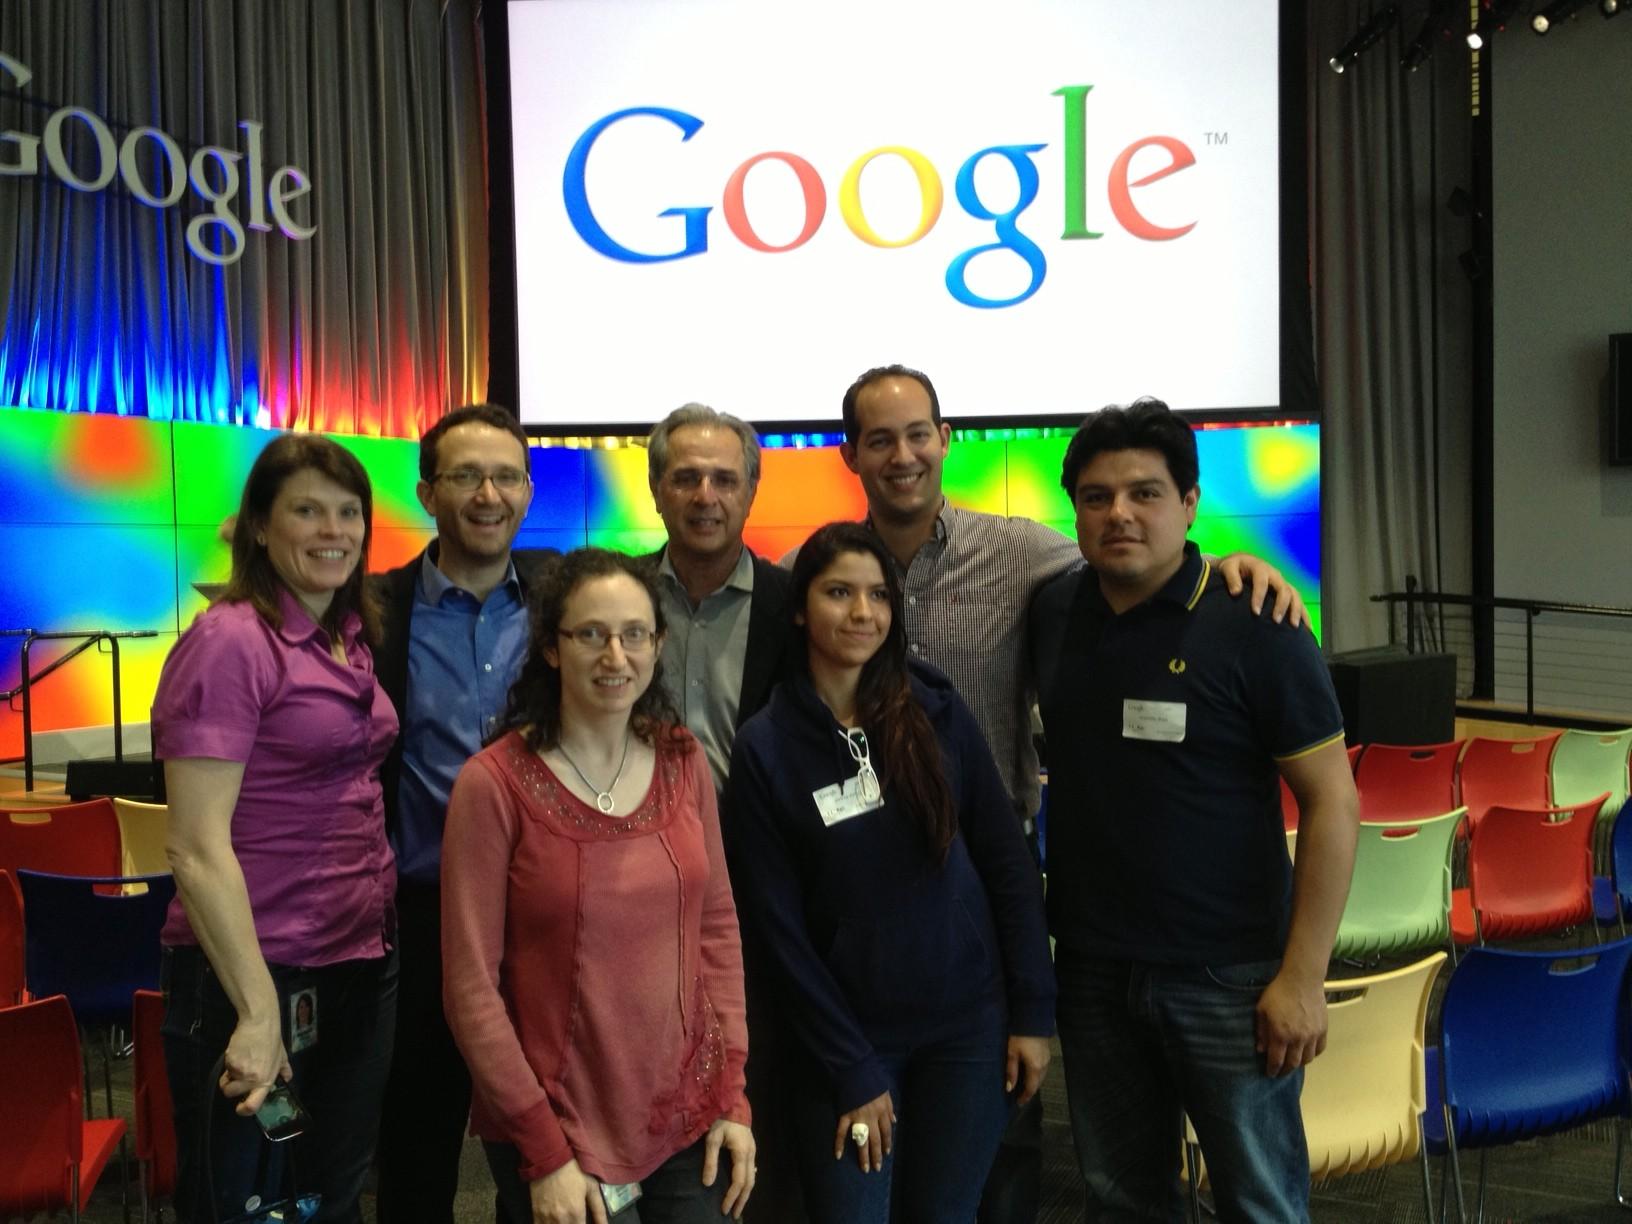 GoogleTalks features Rodrigo Arboleda